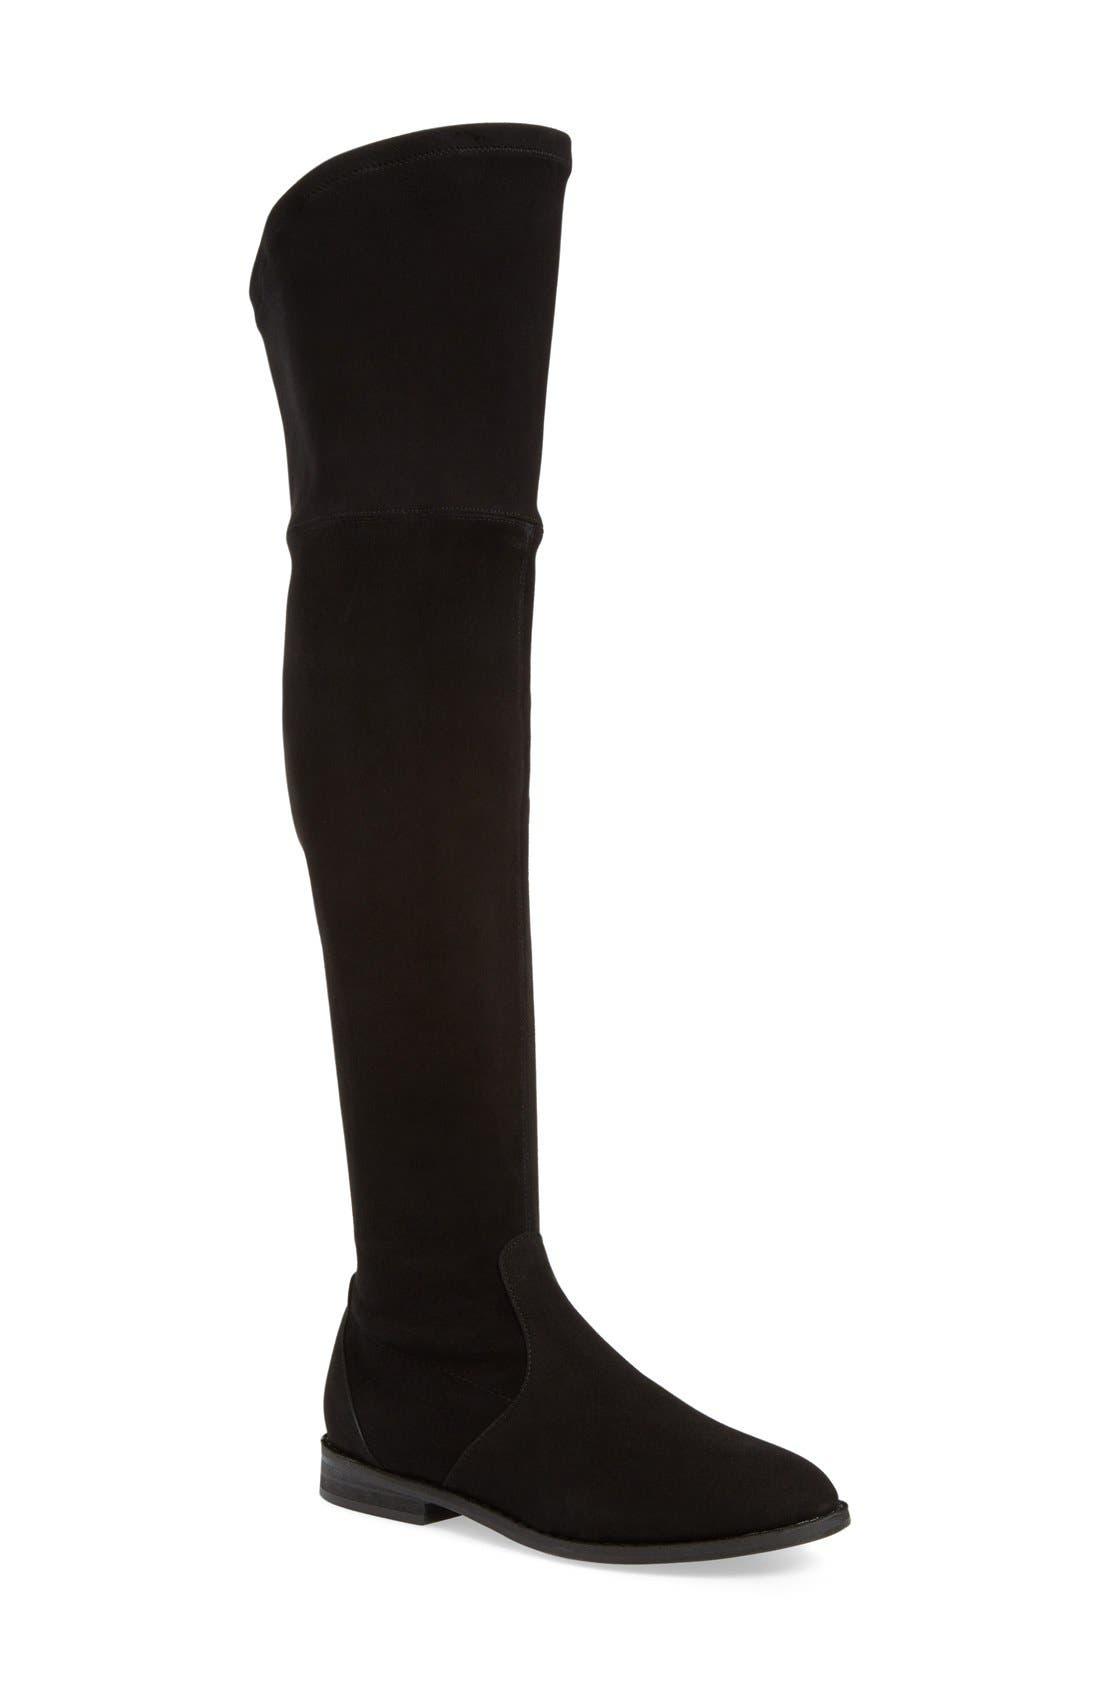 Alternate Image 1 Selected - Gentle Souls 'Emma' Over the Knee Boot (Women) (Narrow Calf)